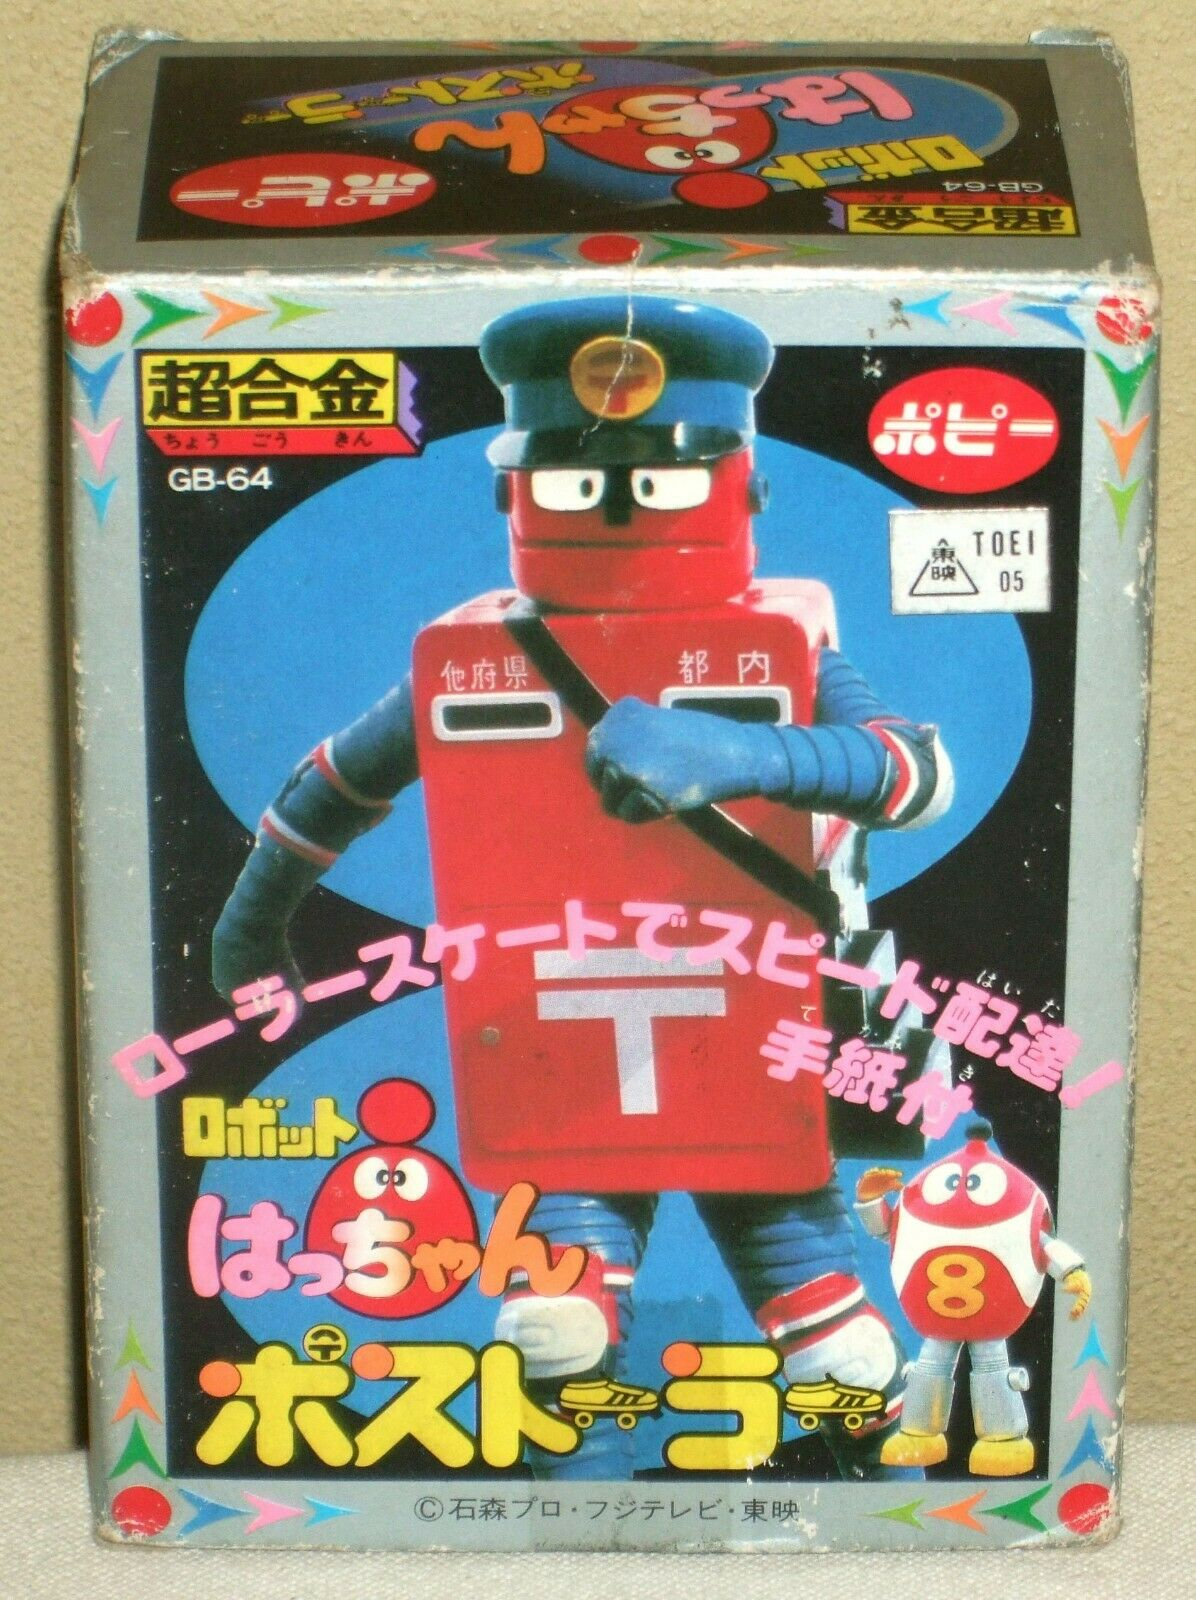 Robot 8-Chan Postler Post Chogokin GB-64 Figure Dolls 4.1  10.4cm Popy 1981 Mint